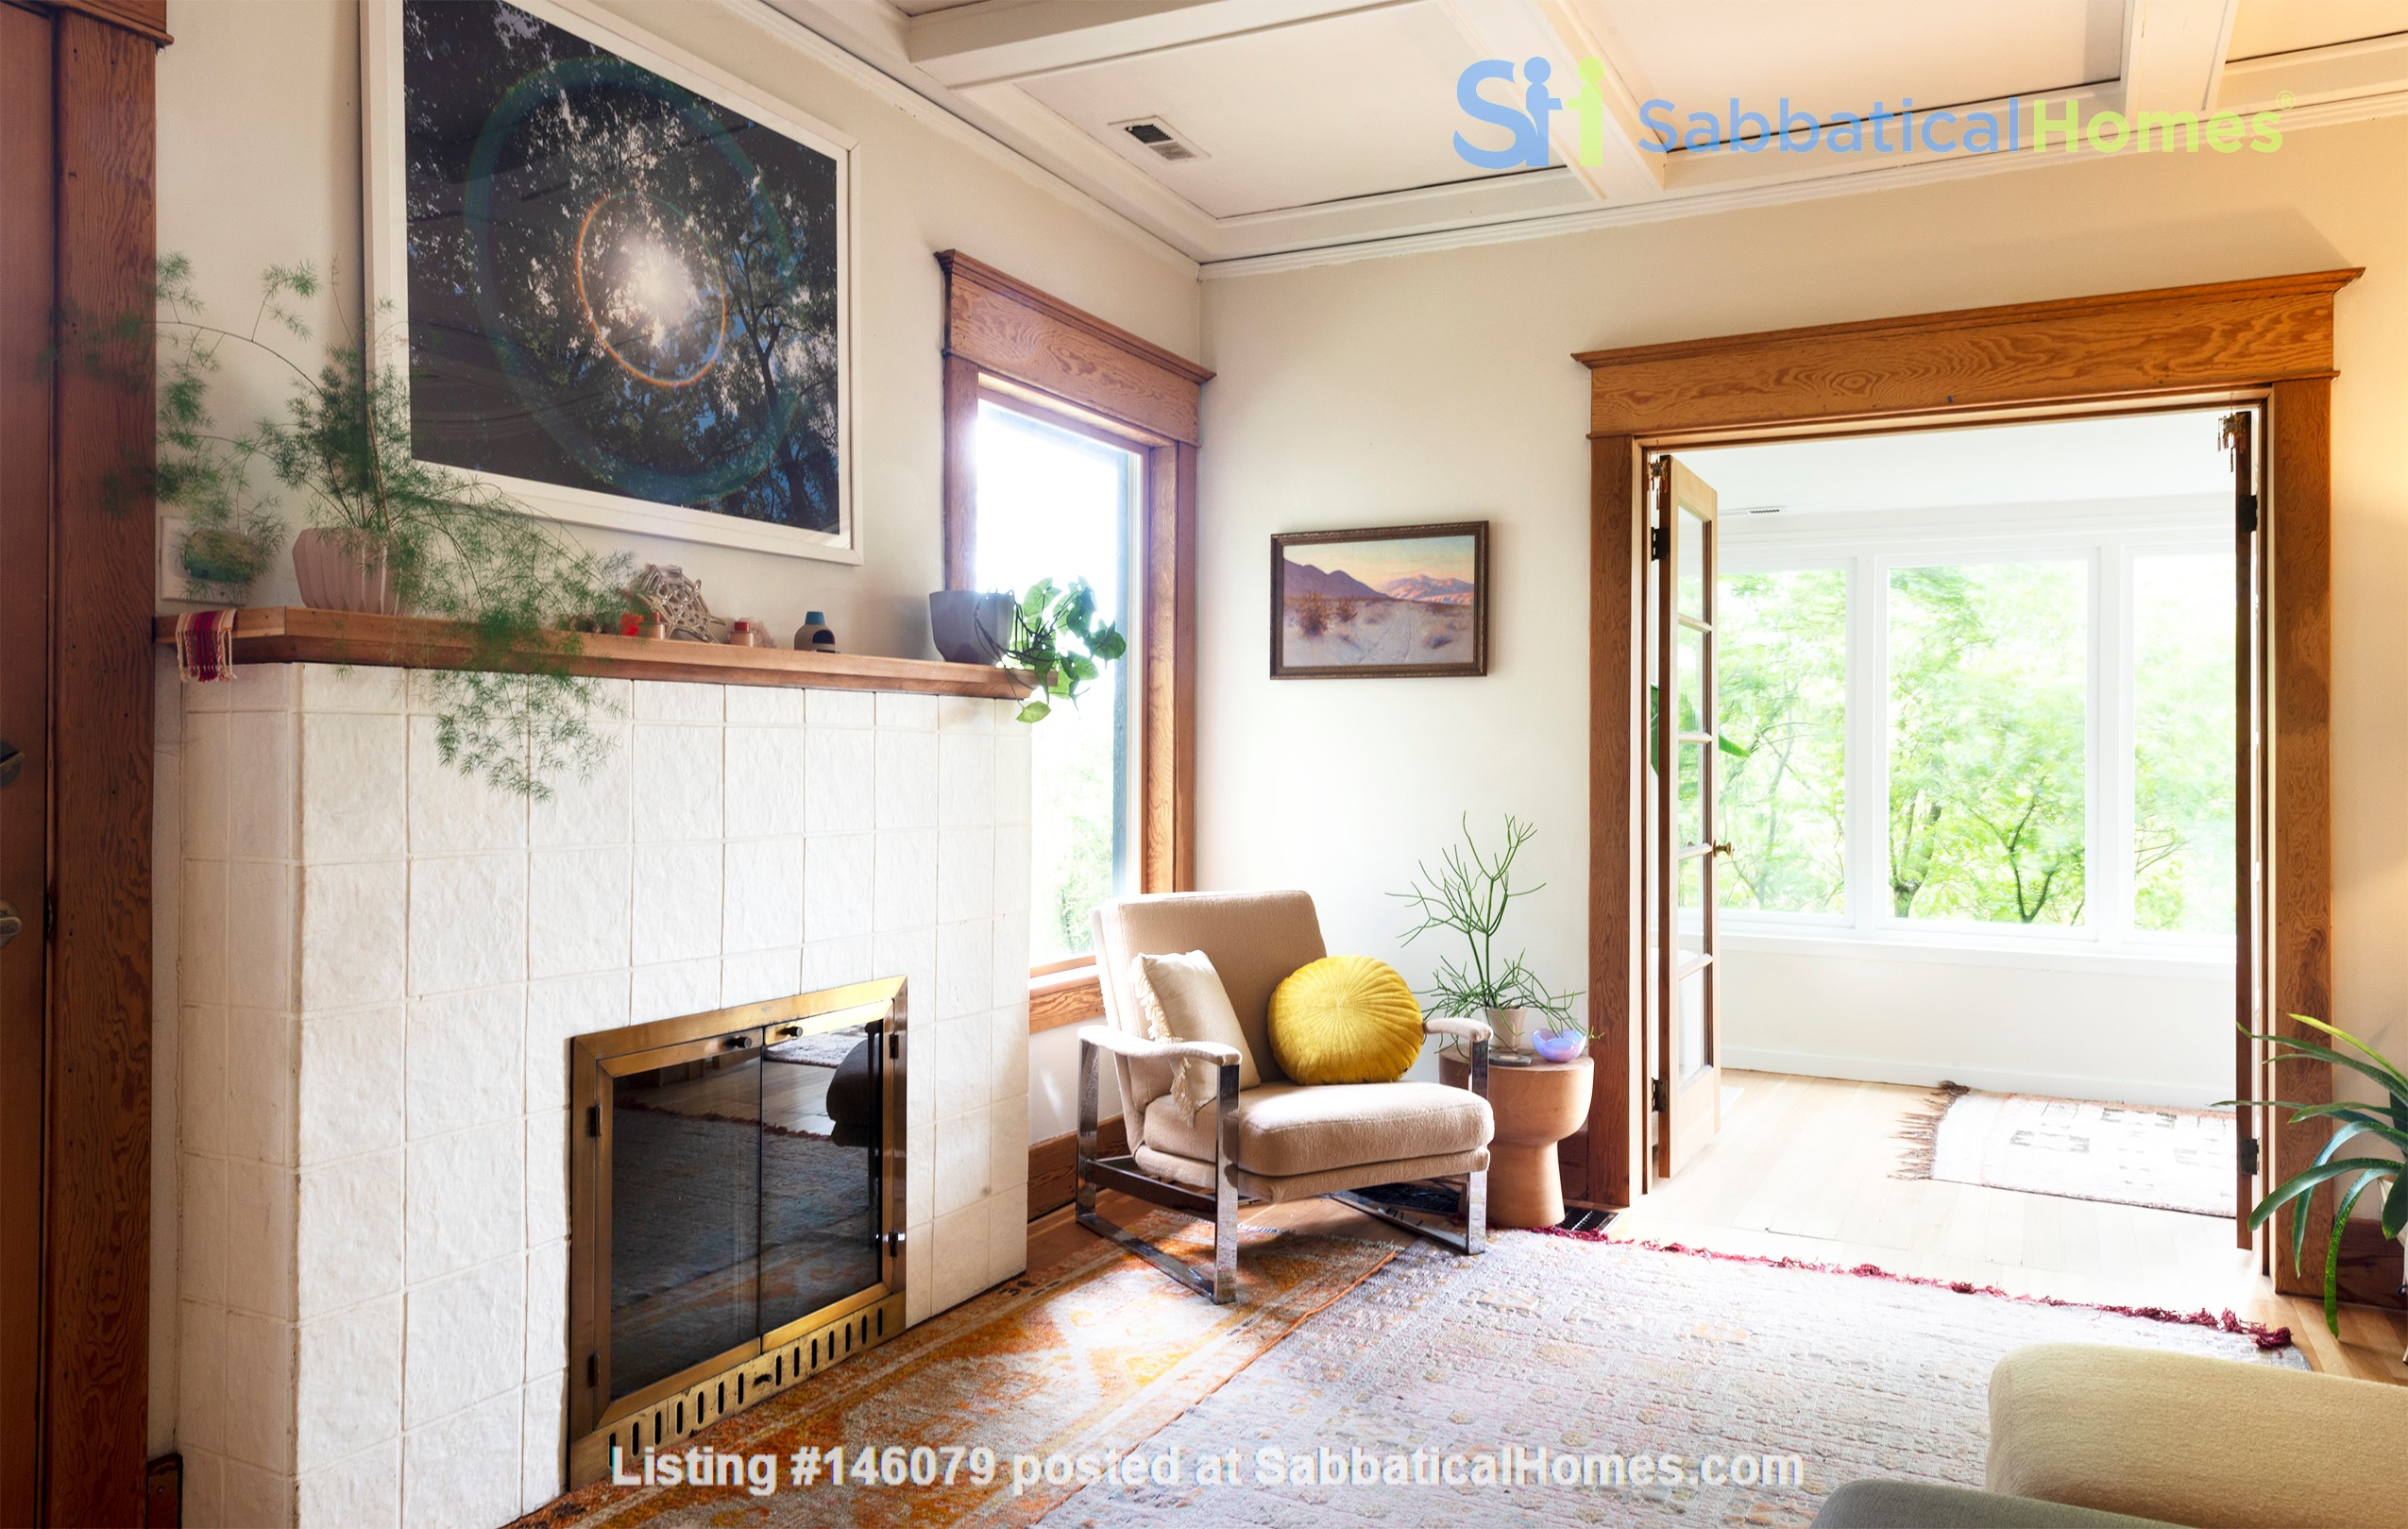 Scandinavian Queen Anne Home Home Rental in Seattle 2